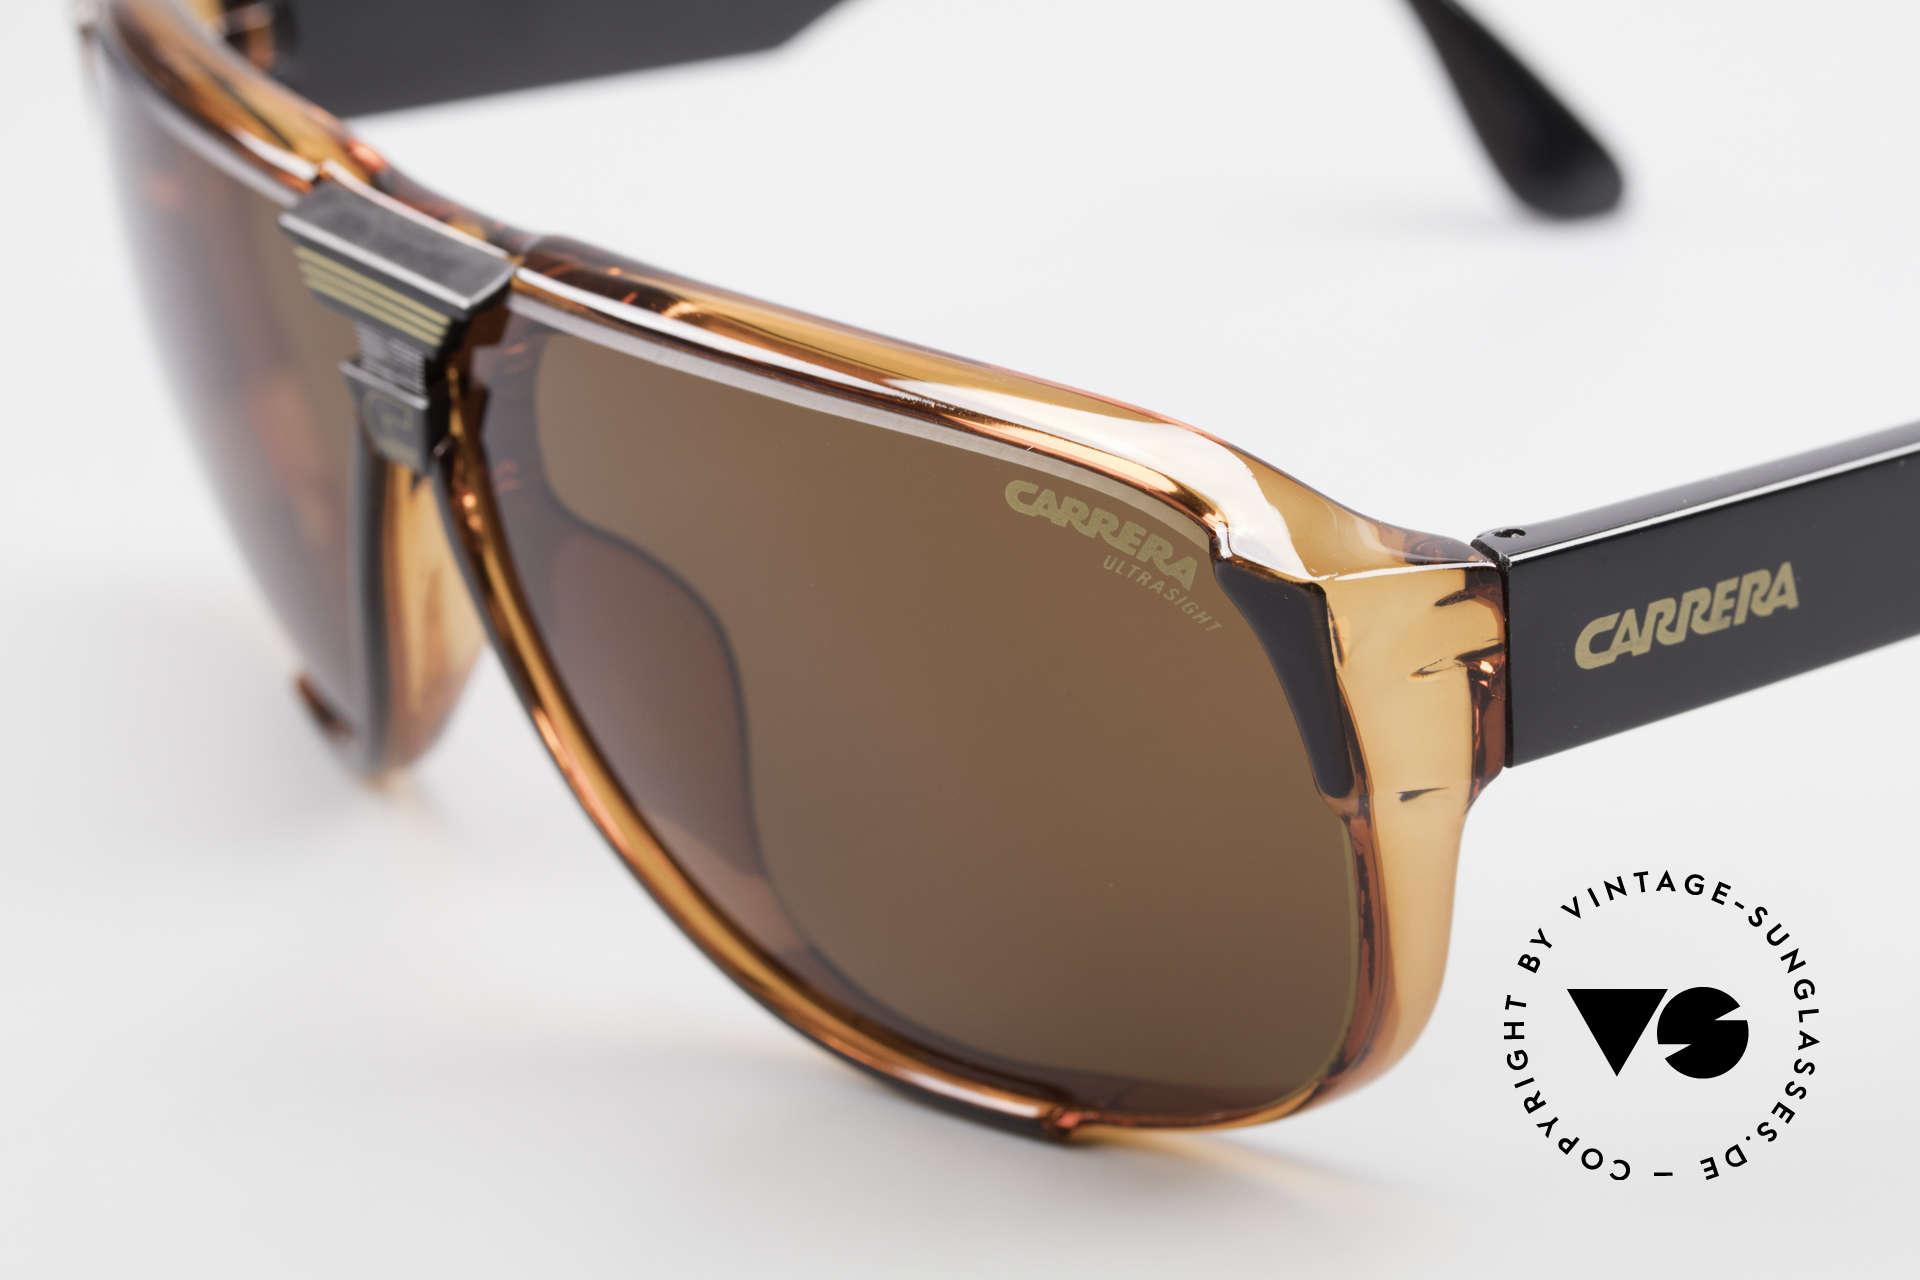 Carrera 5431 Men's 80's Sportsglasses Optyl, brown Ultrasight and brown-gradient (100% UV), Made for Men